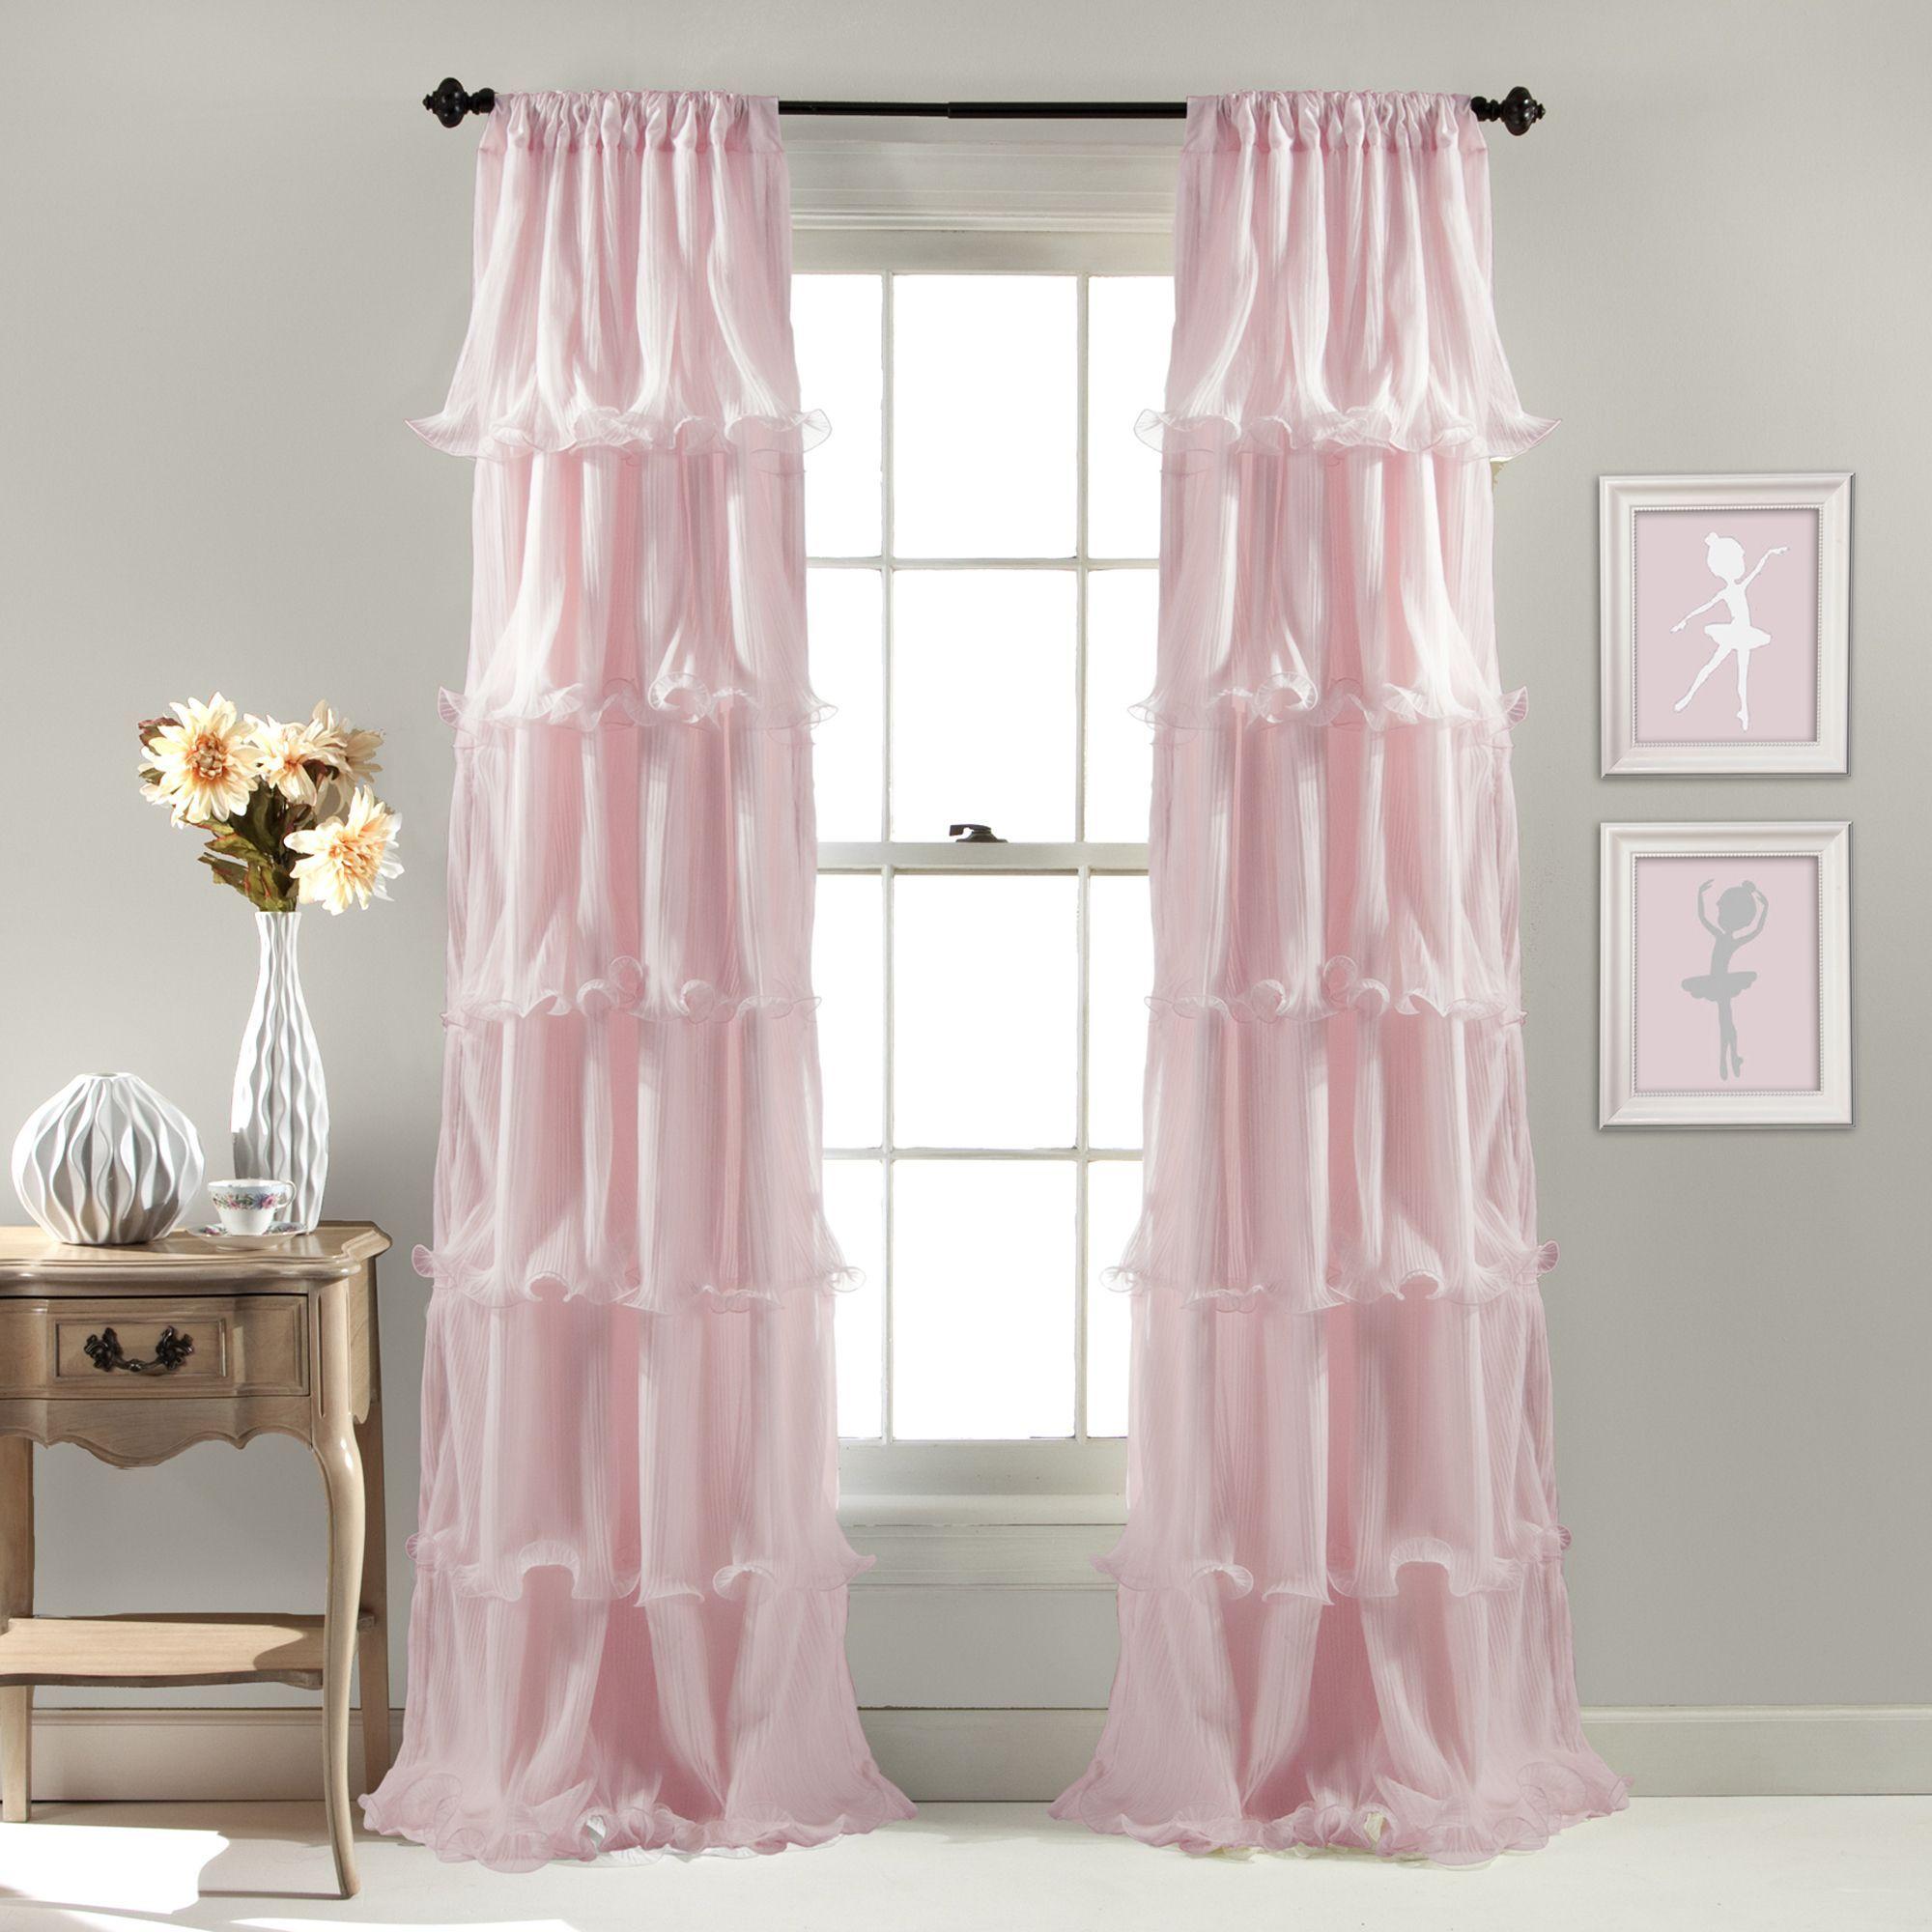 Lush Decor Nerina Ruffled Curtain Panel 54 W X 84 L Pink